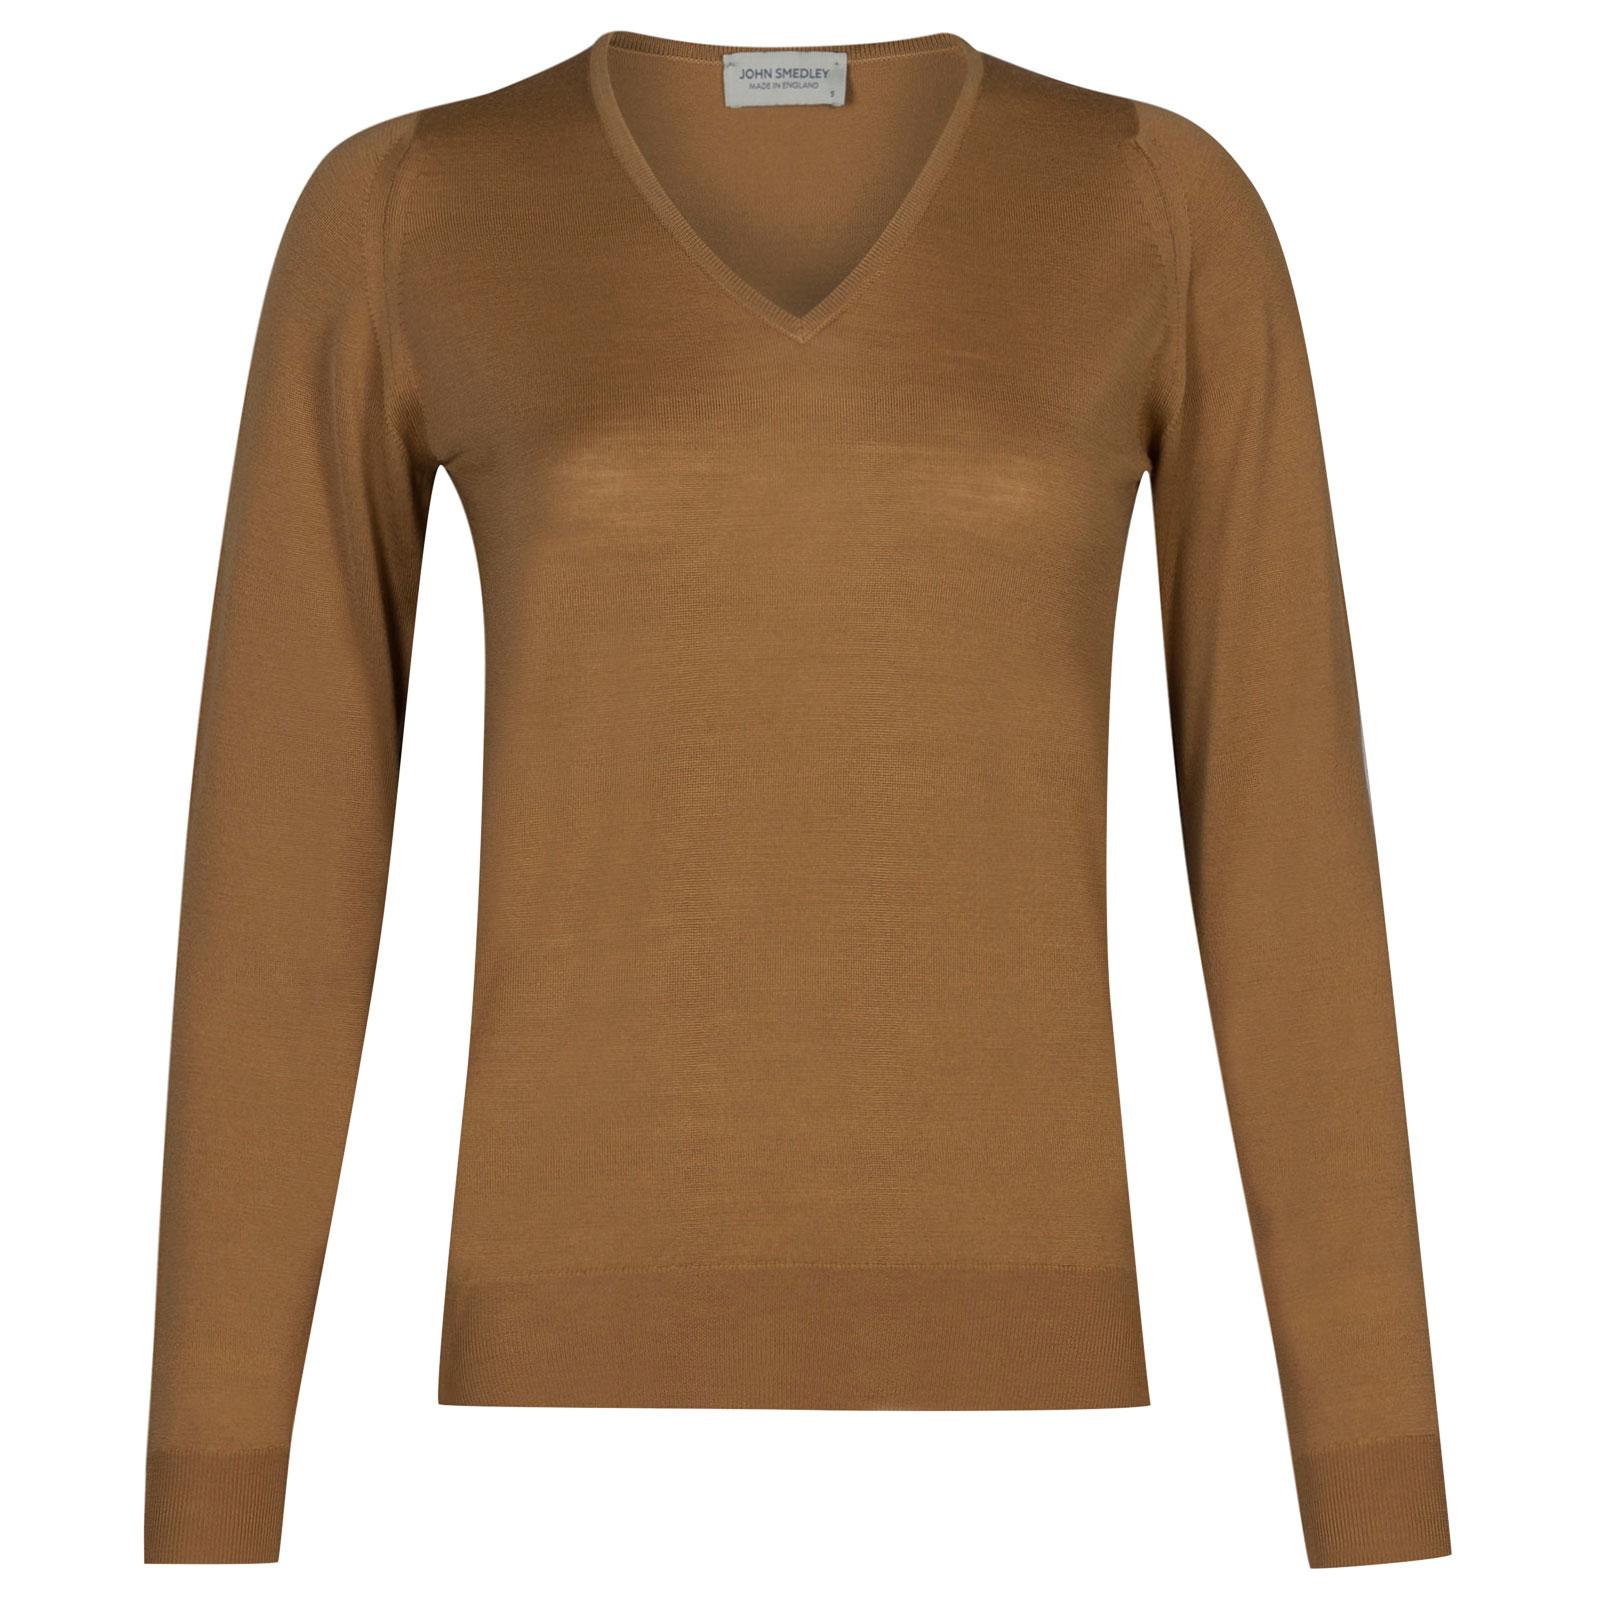 John Smedley manarola Merino Wool Sweater in Camel-M